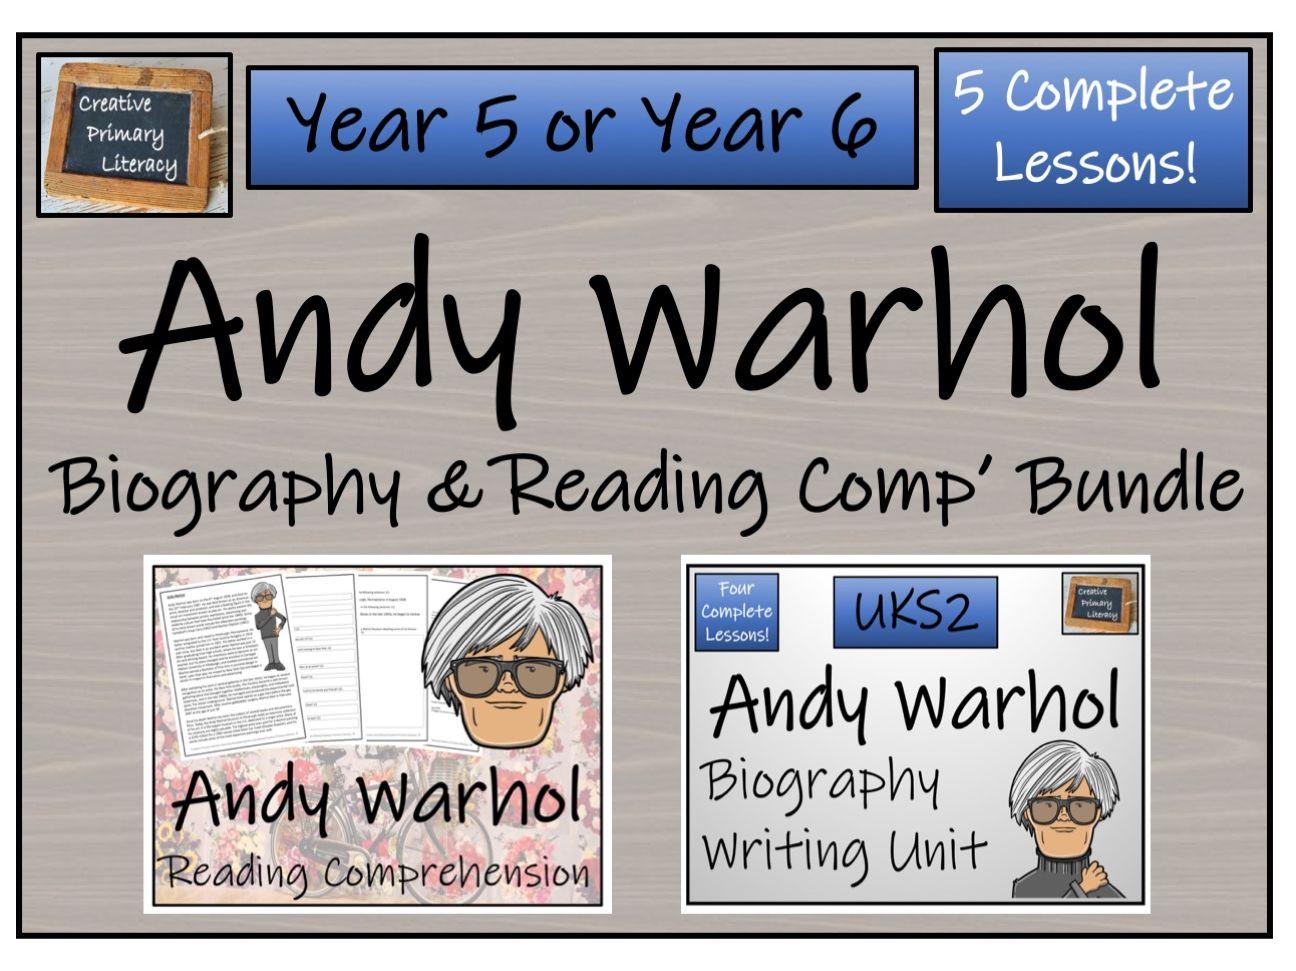 UKS2 Literacy - Andy Warhol Reading Comprehension & Biography Bundle